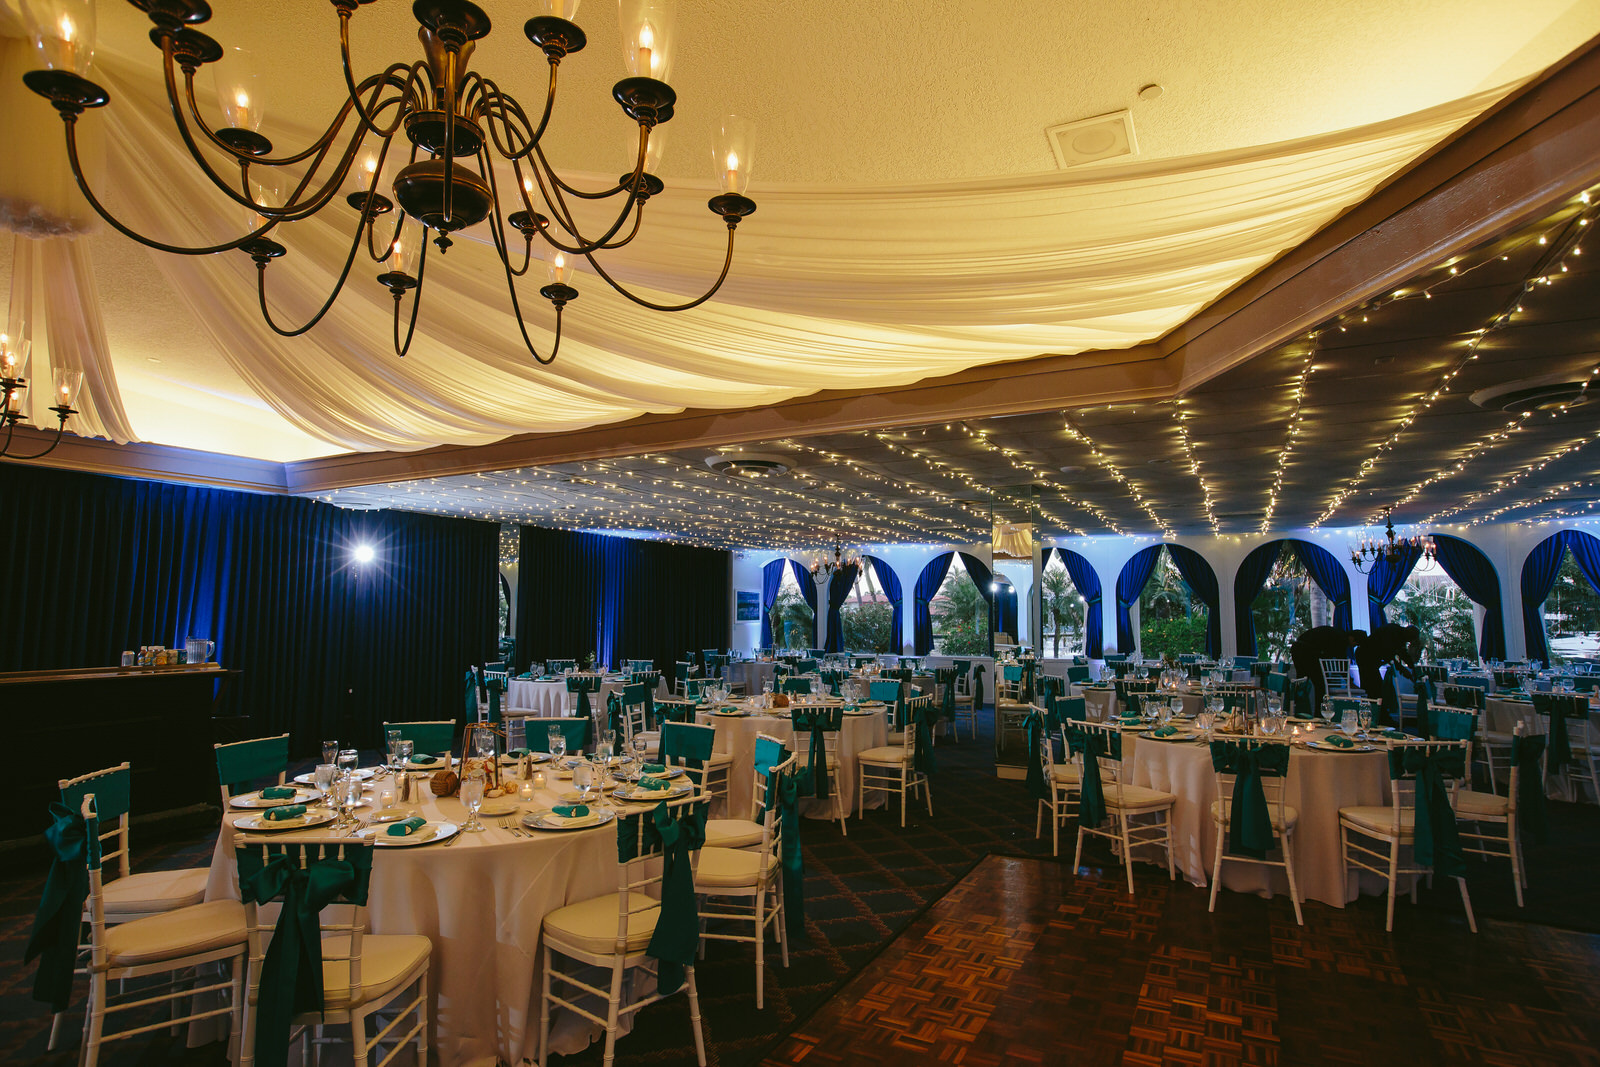 lighthouse_point_yacht_club_wedding_reception_steph_lynn_photo-23.jpg